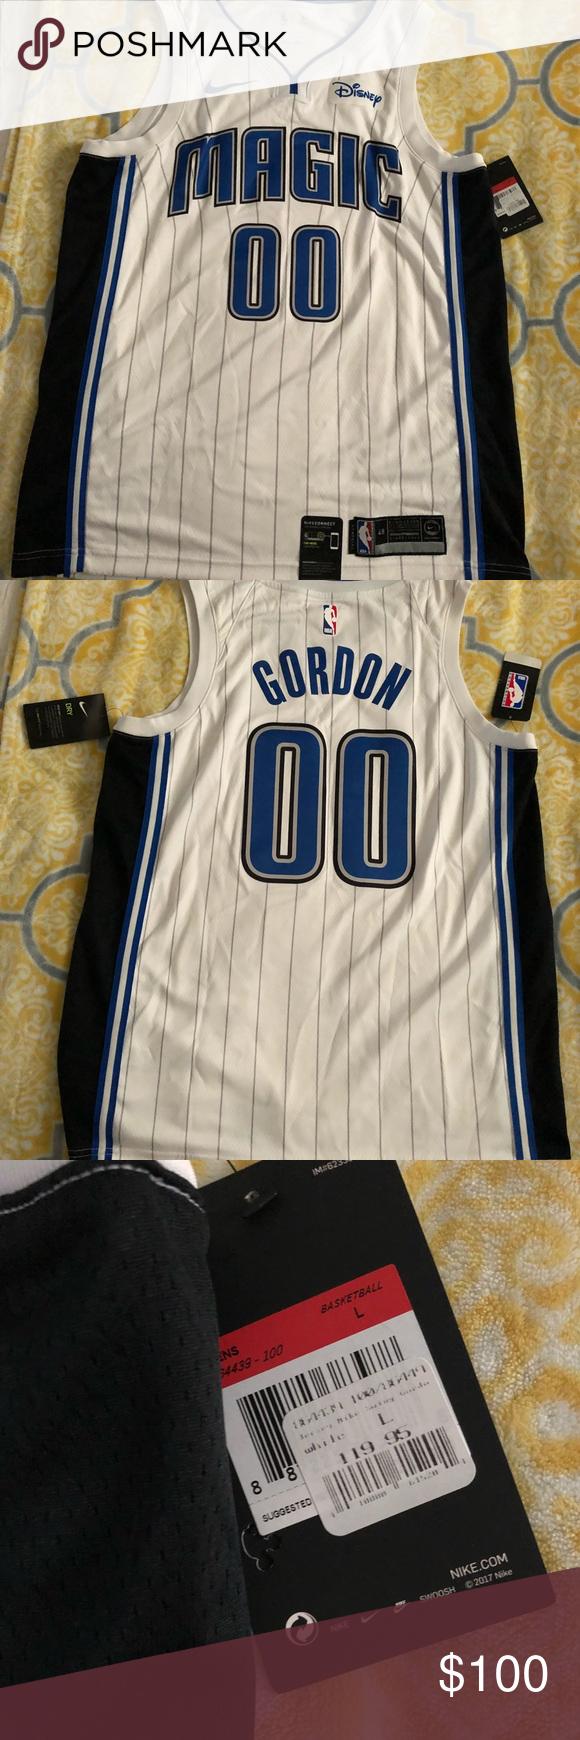 new style 25873 6a4fb Nike Disney Gordon Orlando Magic Jersey Gordon 00 Orlando ...